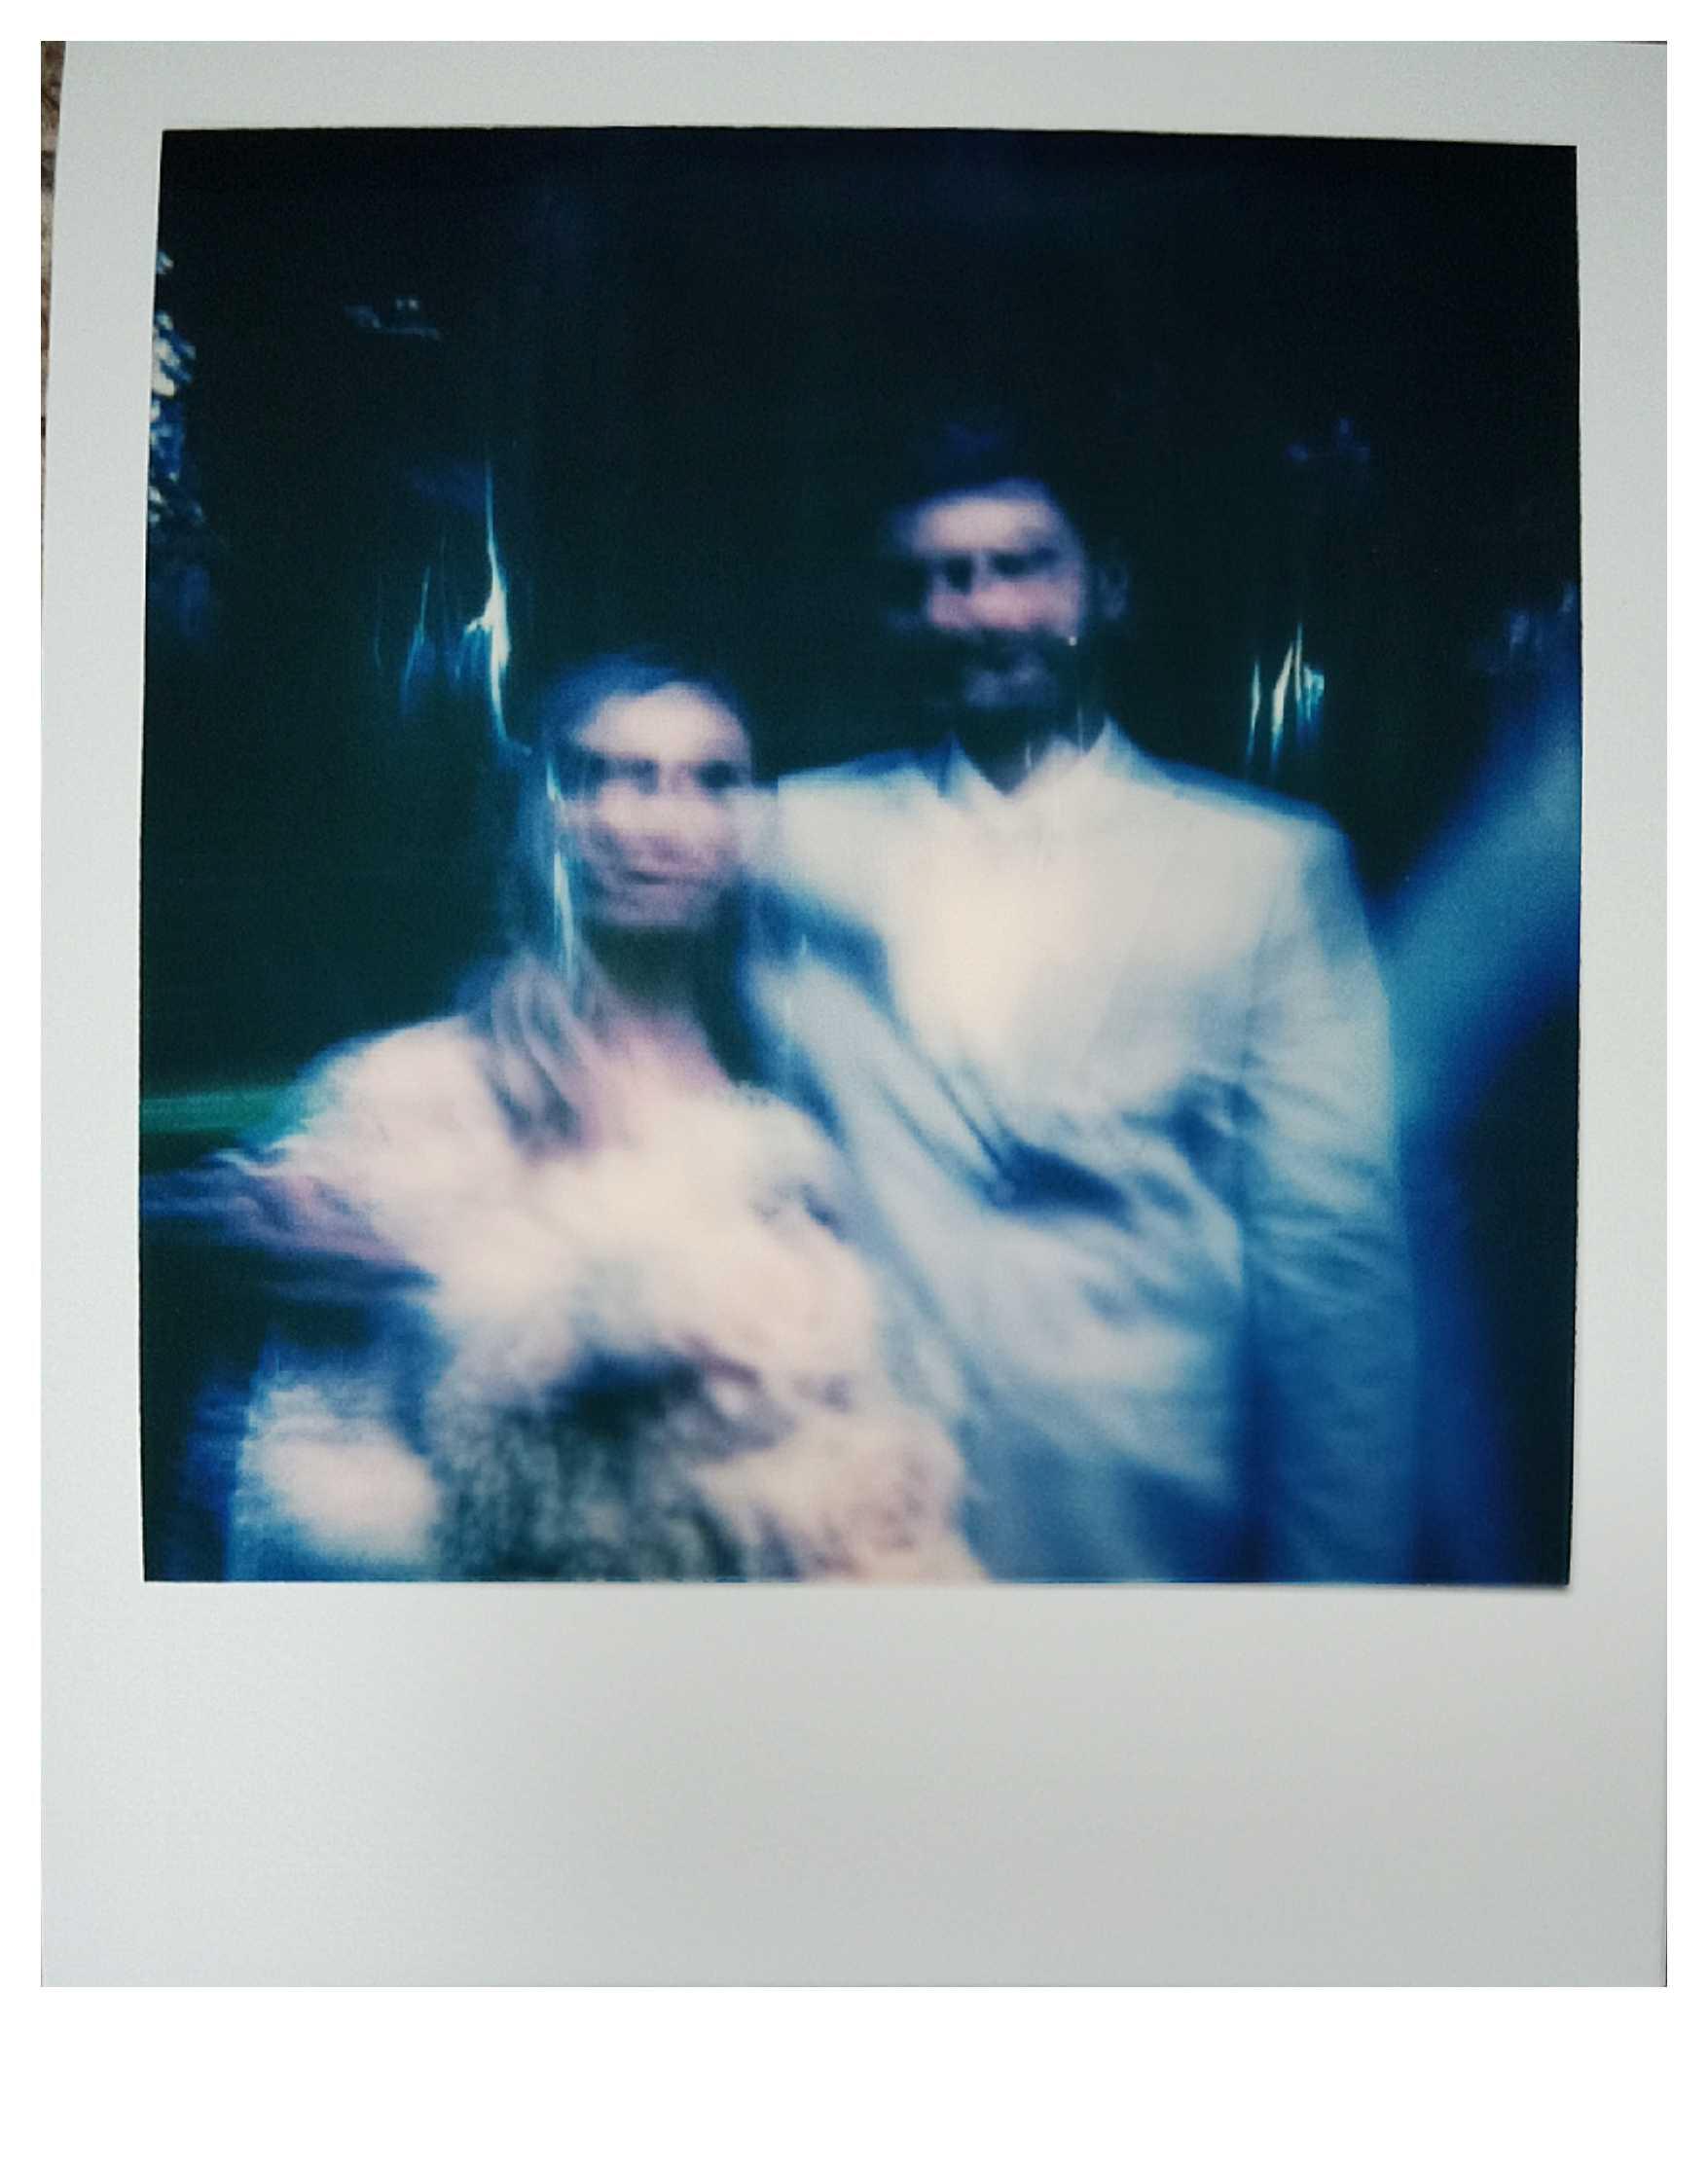 S&A Elopement - Kings & Thieves - Shred 'Til Dead - Central Coast Beach Forest Wedding - 323.jpg